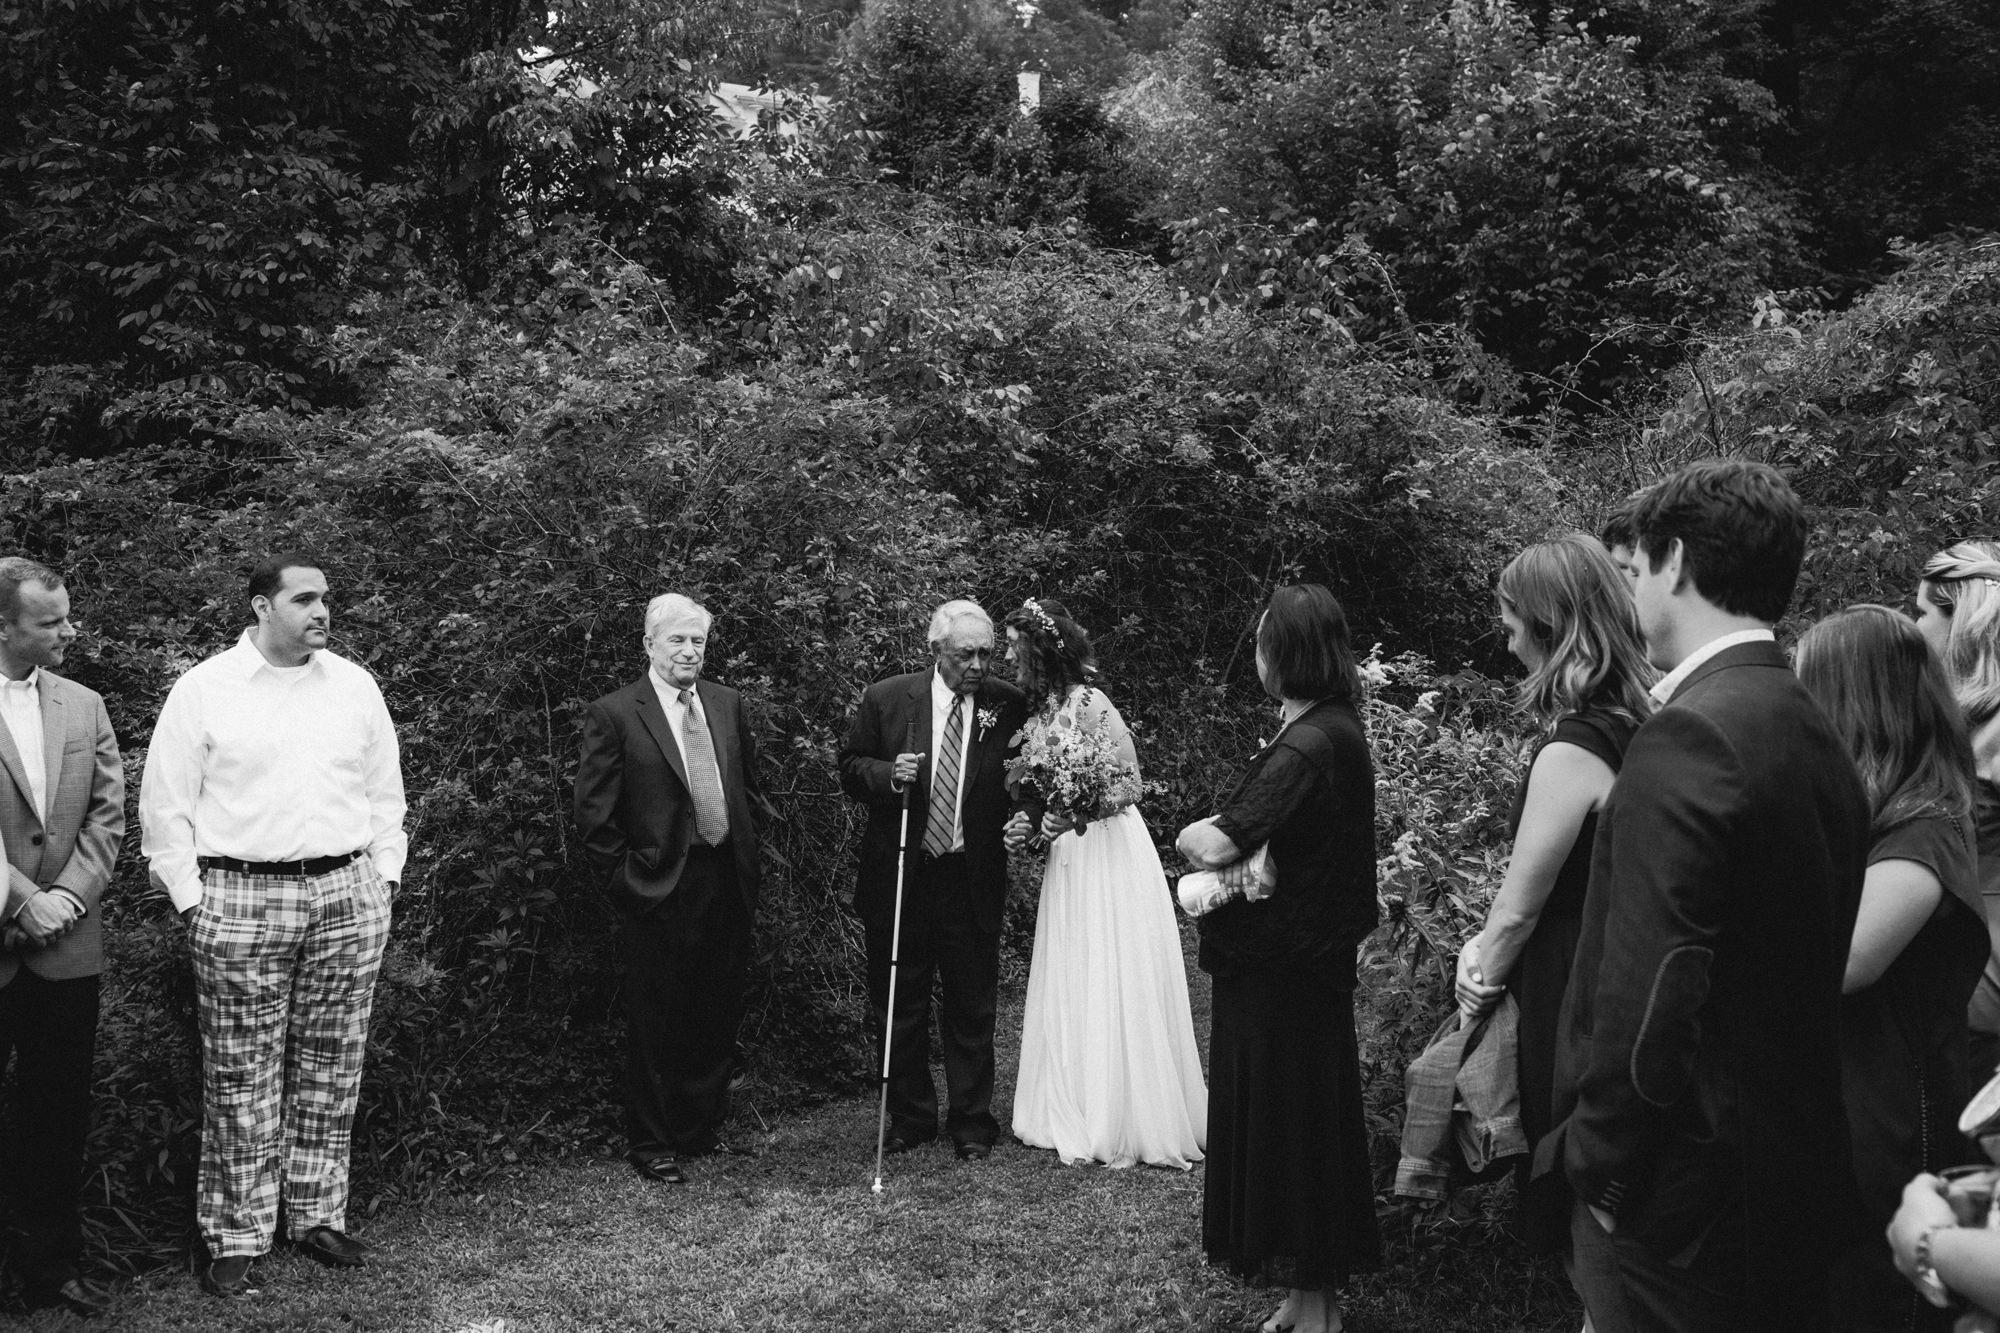 catskills_big_indian_springs_upstate_NY_wedding_sammblake048.jpg